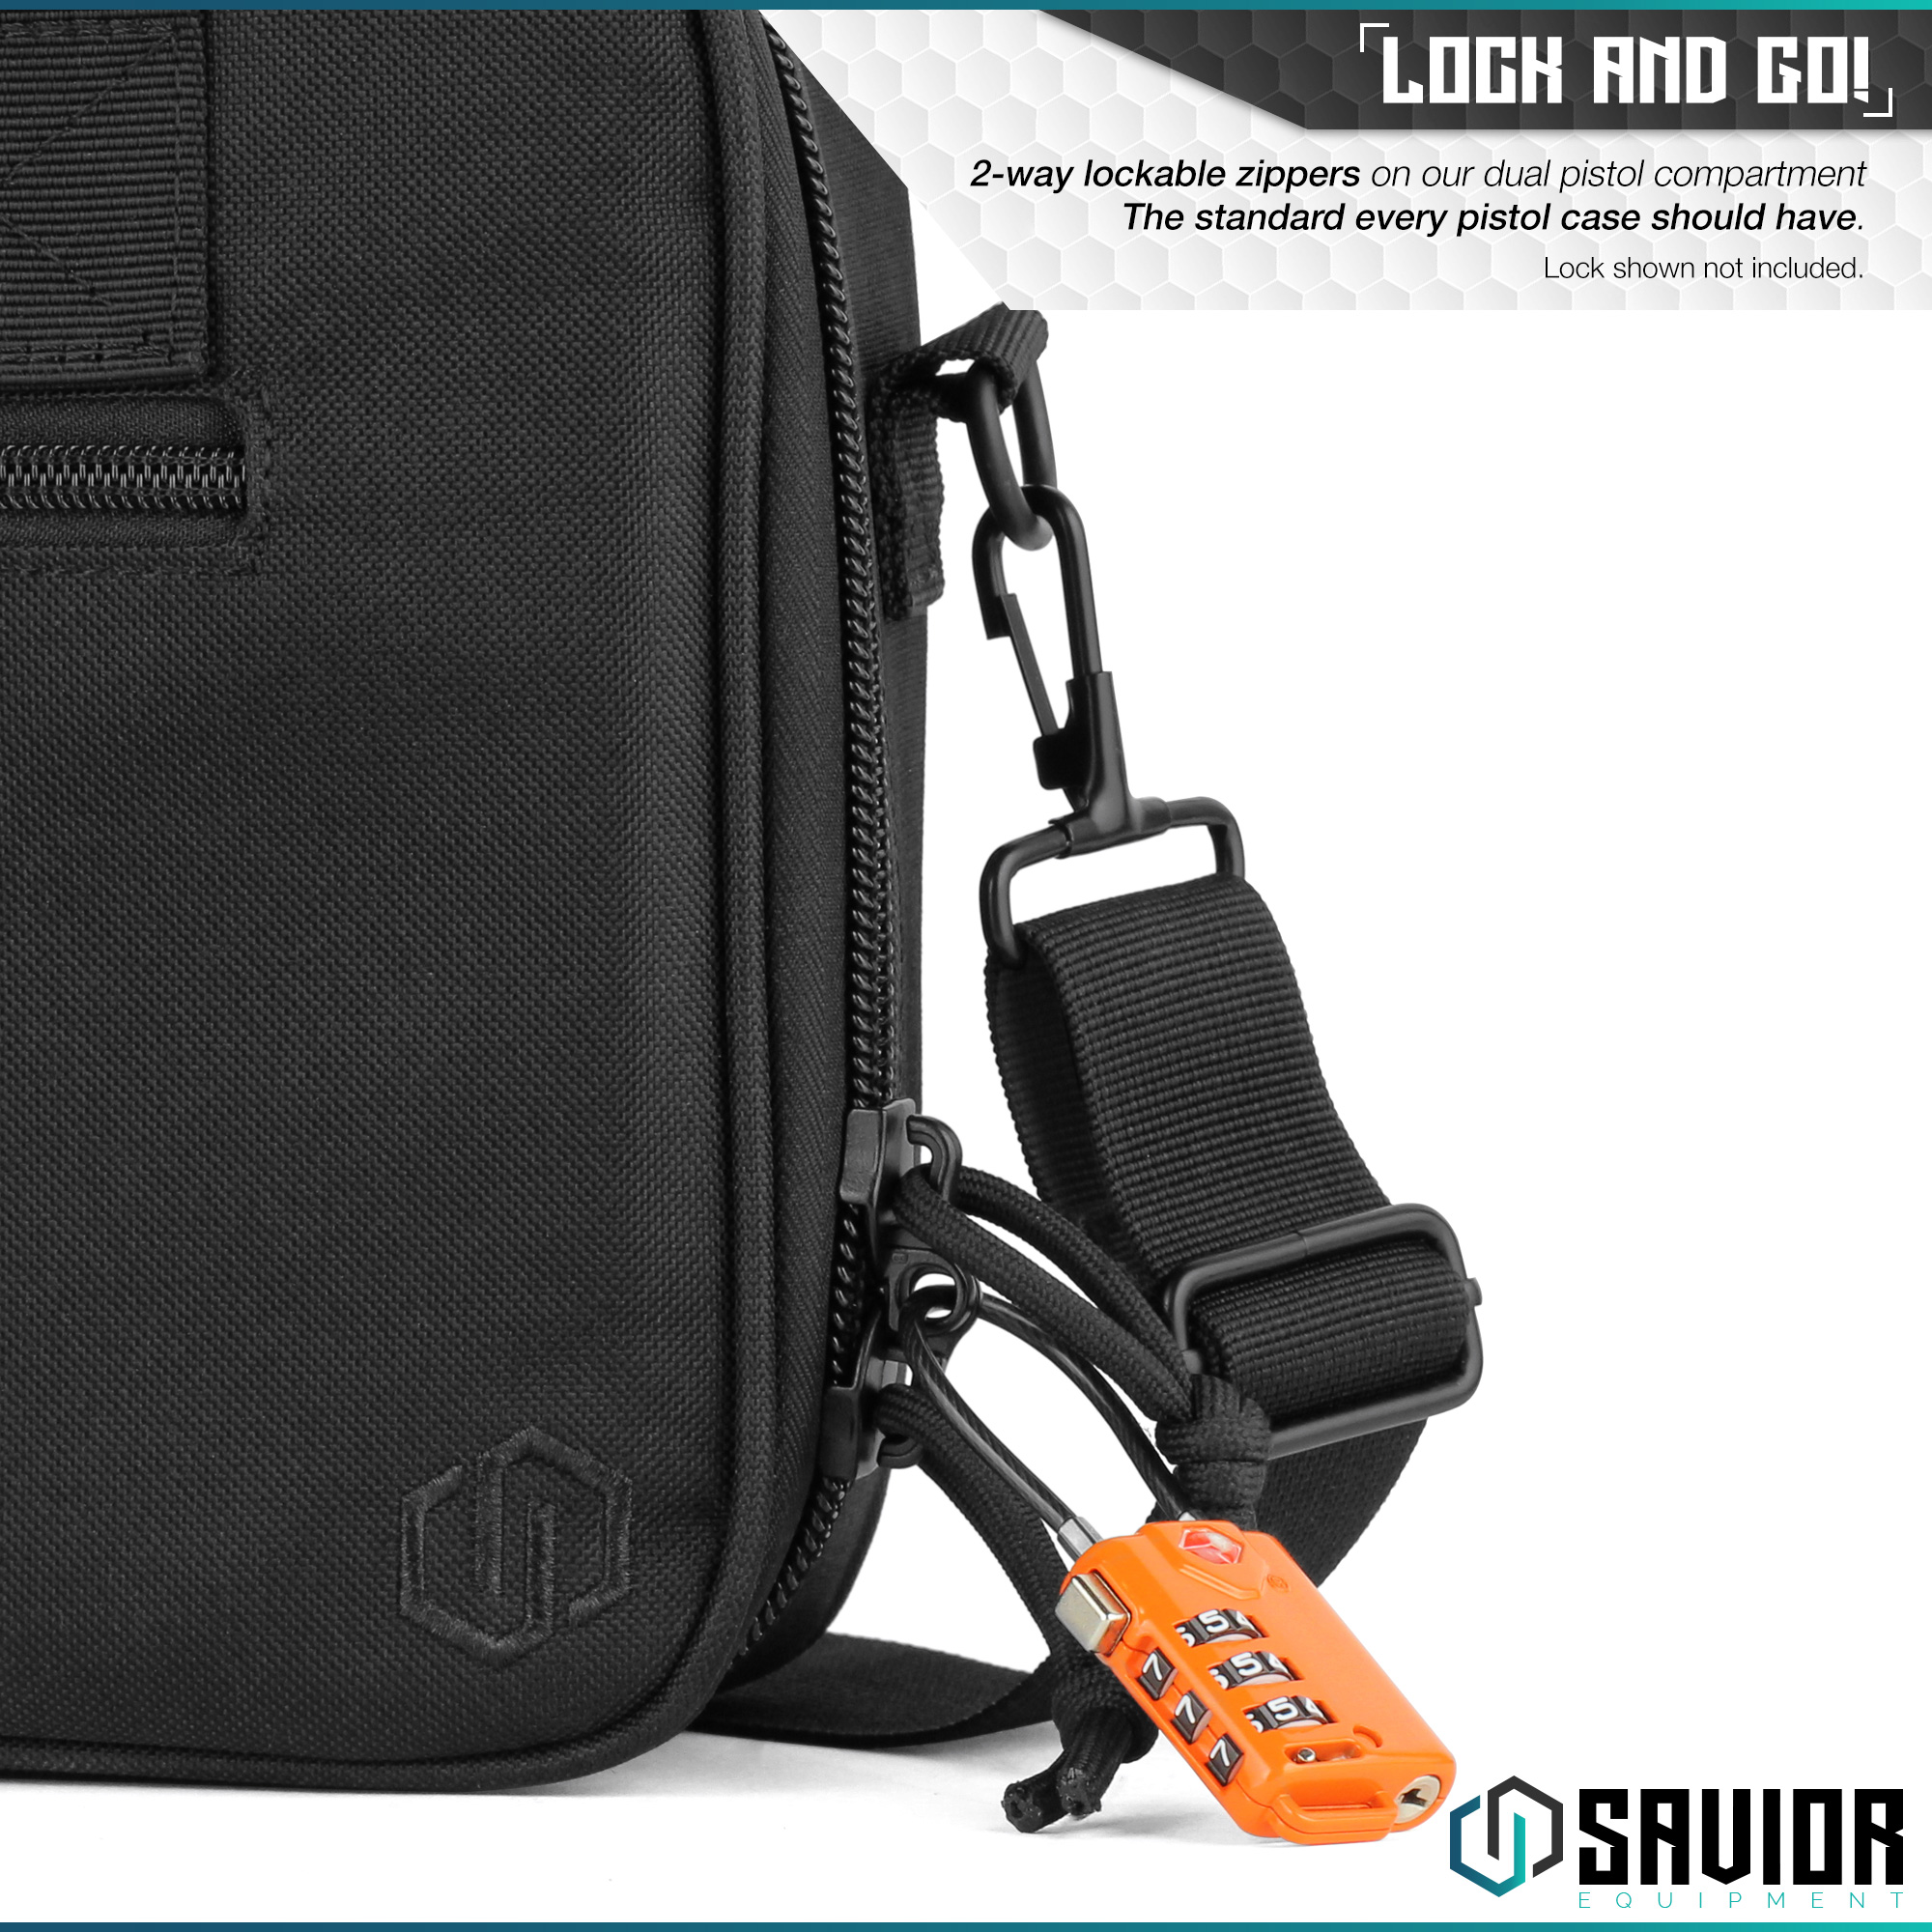 thumbnail 17 - 034-SAVIOR-034-Padded-Discreet-Double-Handgun-Bag-Pistol-Storage-Case-w-Mag-Pouch-Slot